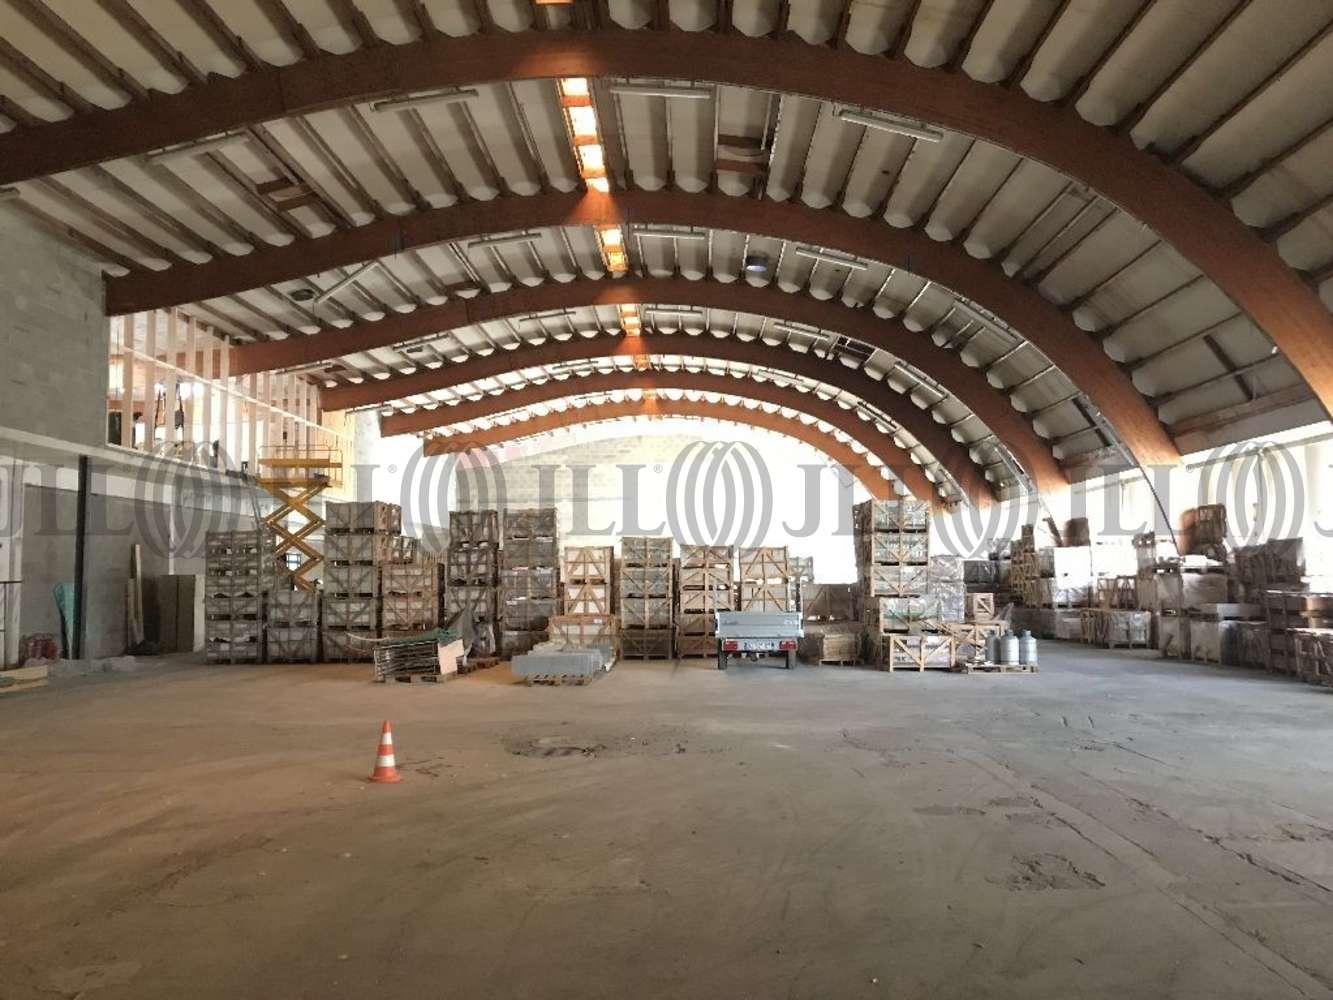 Activités/entrepôt Genay, 69730 - Entrepot à vendre Lyon Nord - Genay - 10312222